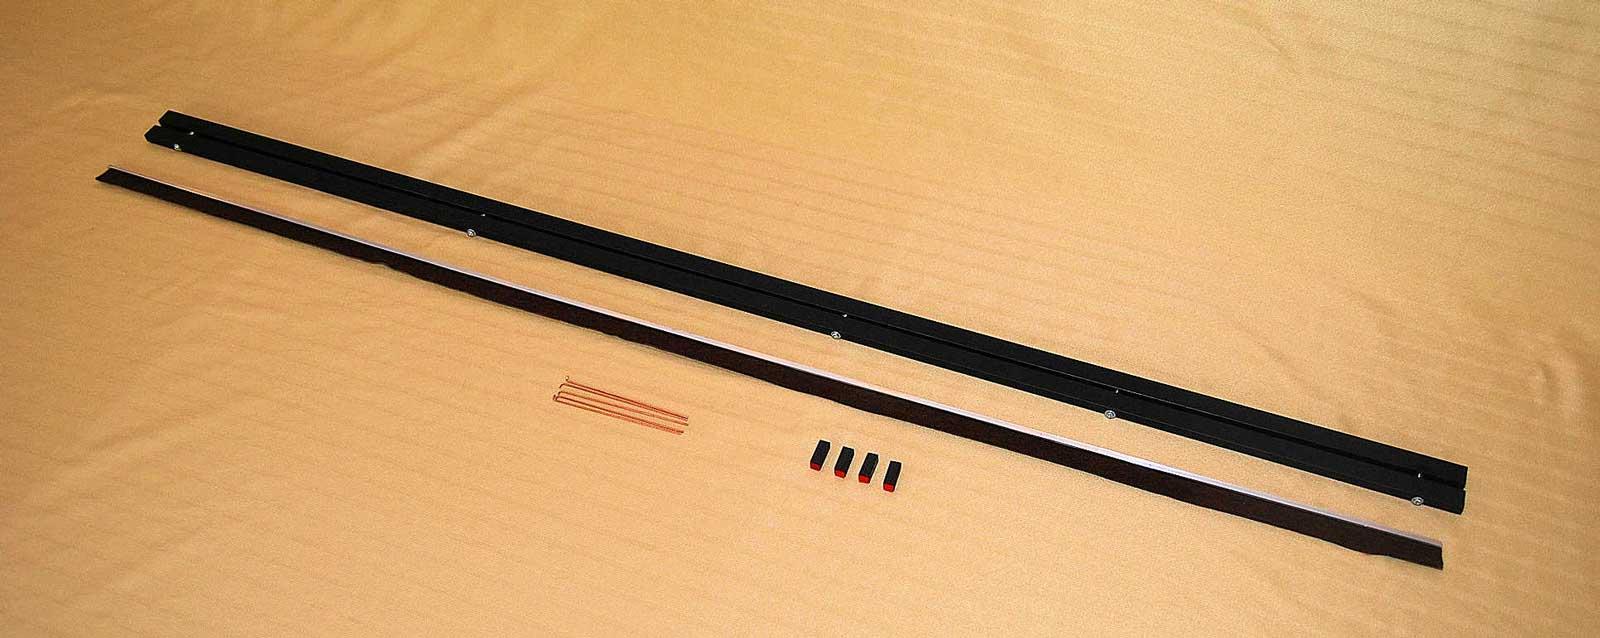 RPC© Grand Piano Mute Rail Kit